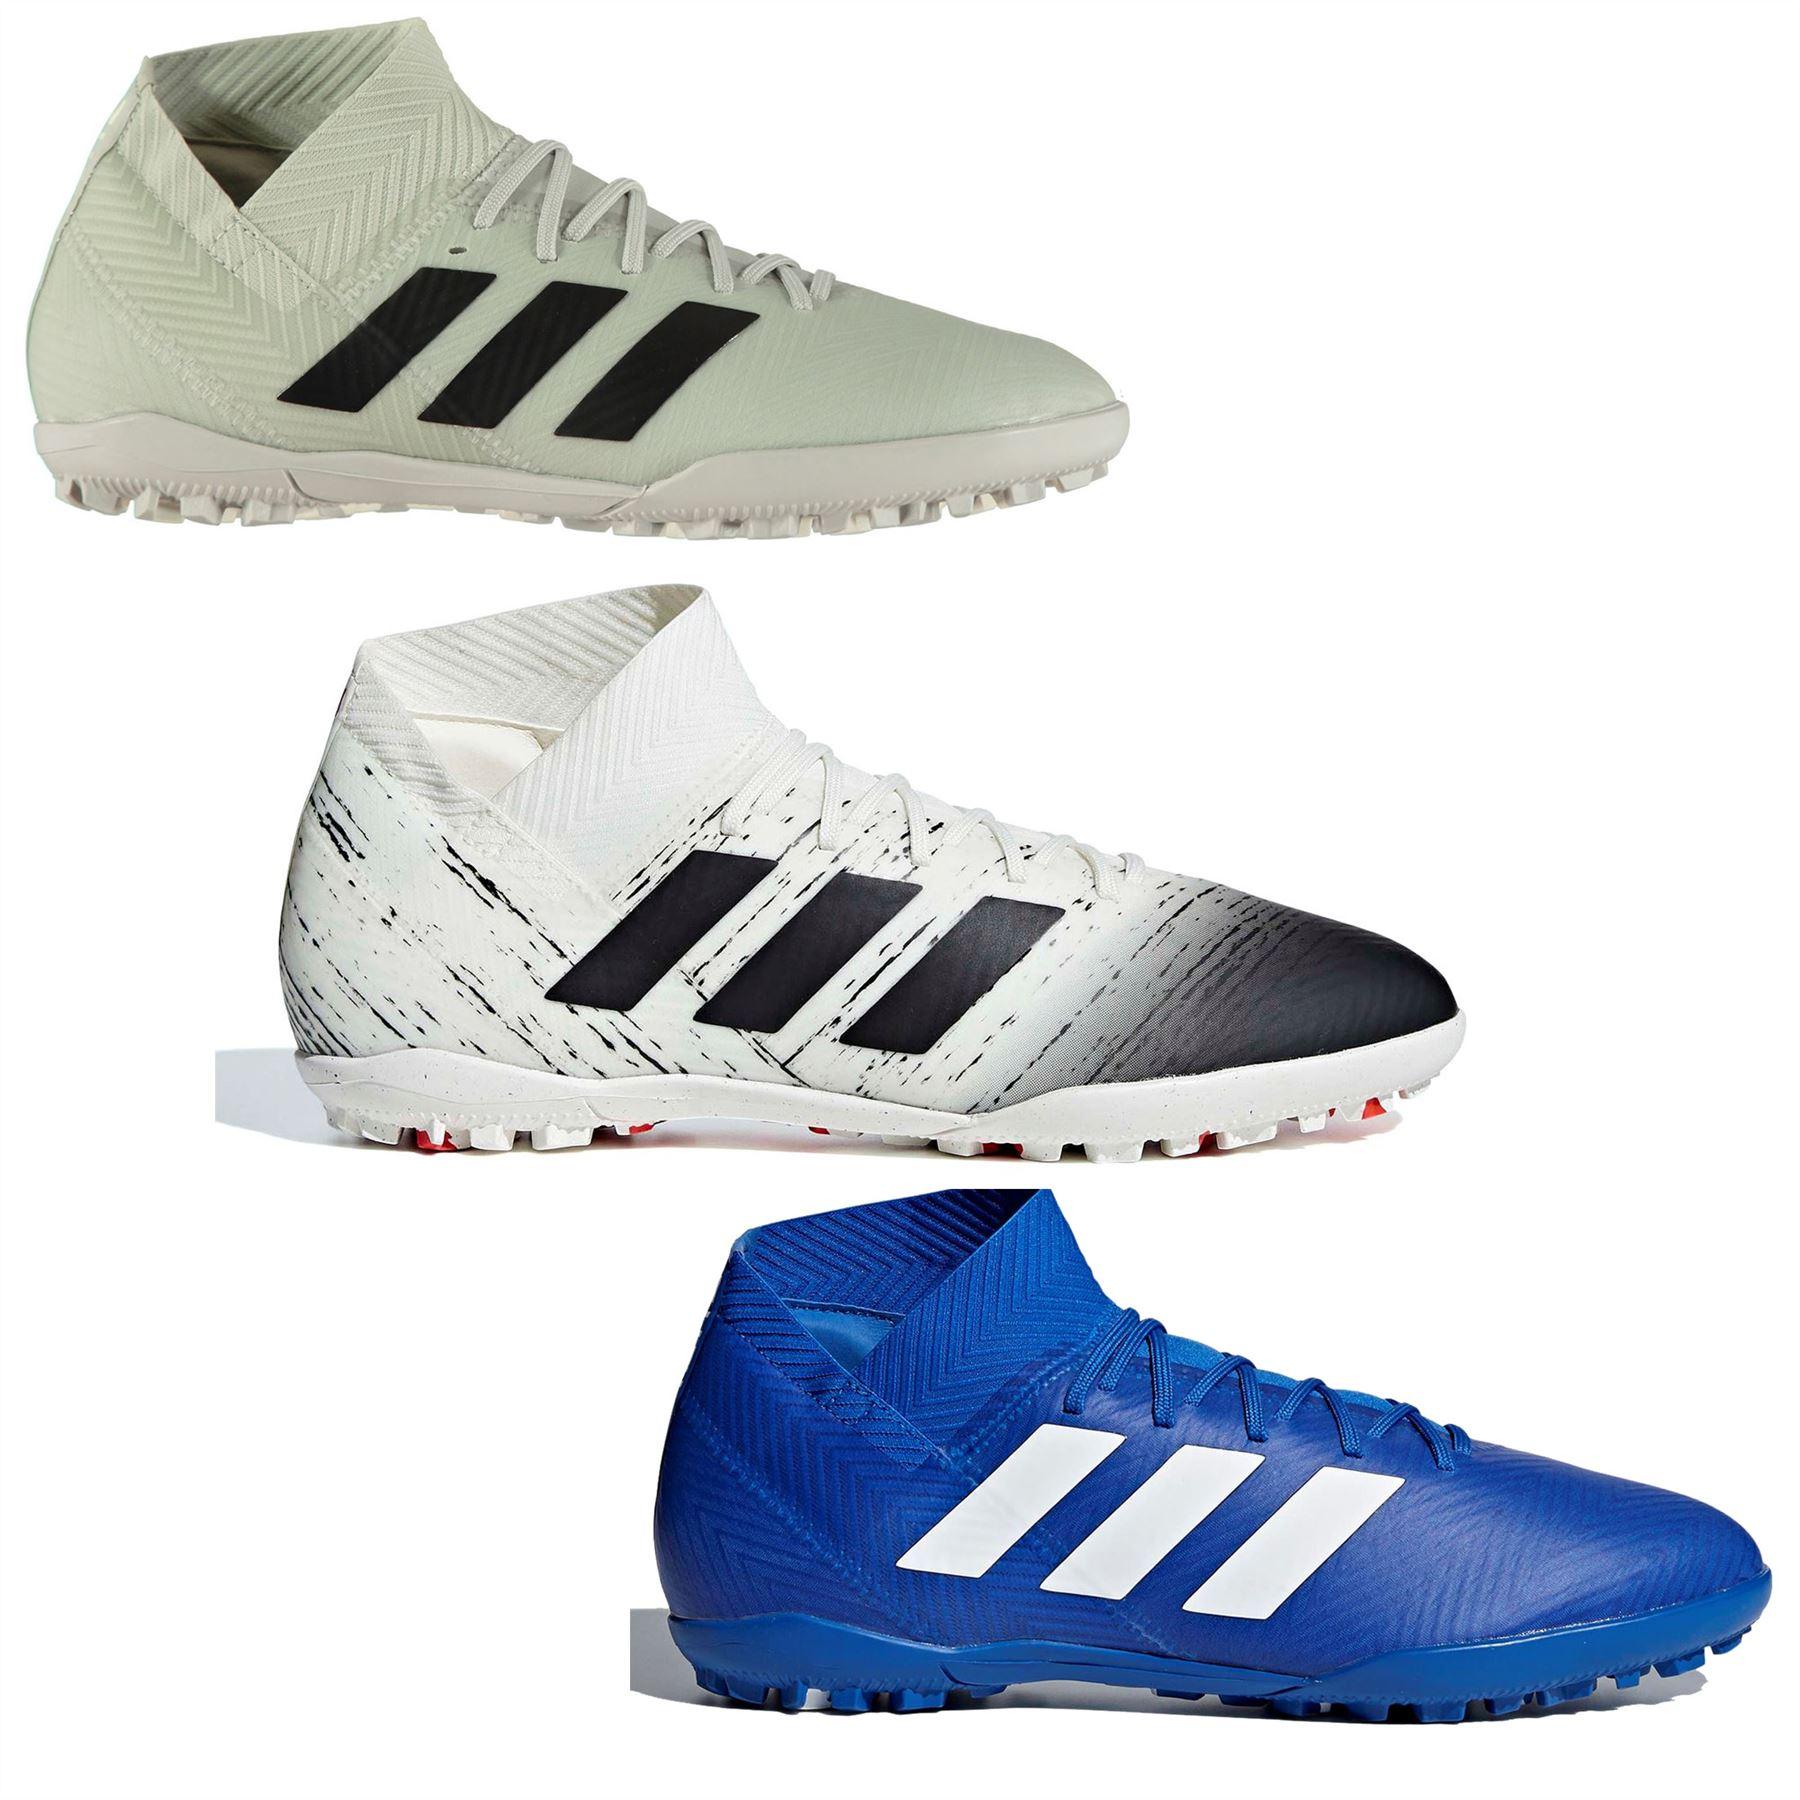 d2f97affe70b ... adidas Nemeziz Tango 18.3 Astro Turf Football Trainers Mens Soccer Shoe  Sneakers ...